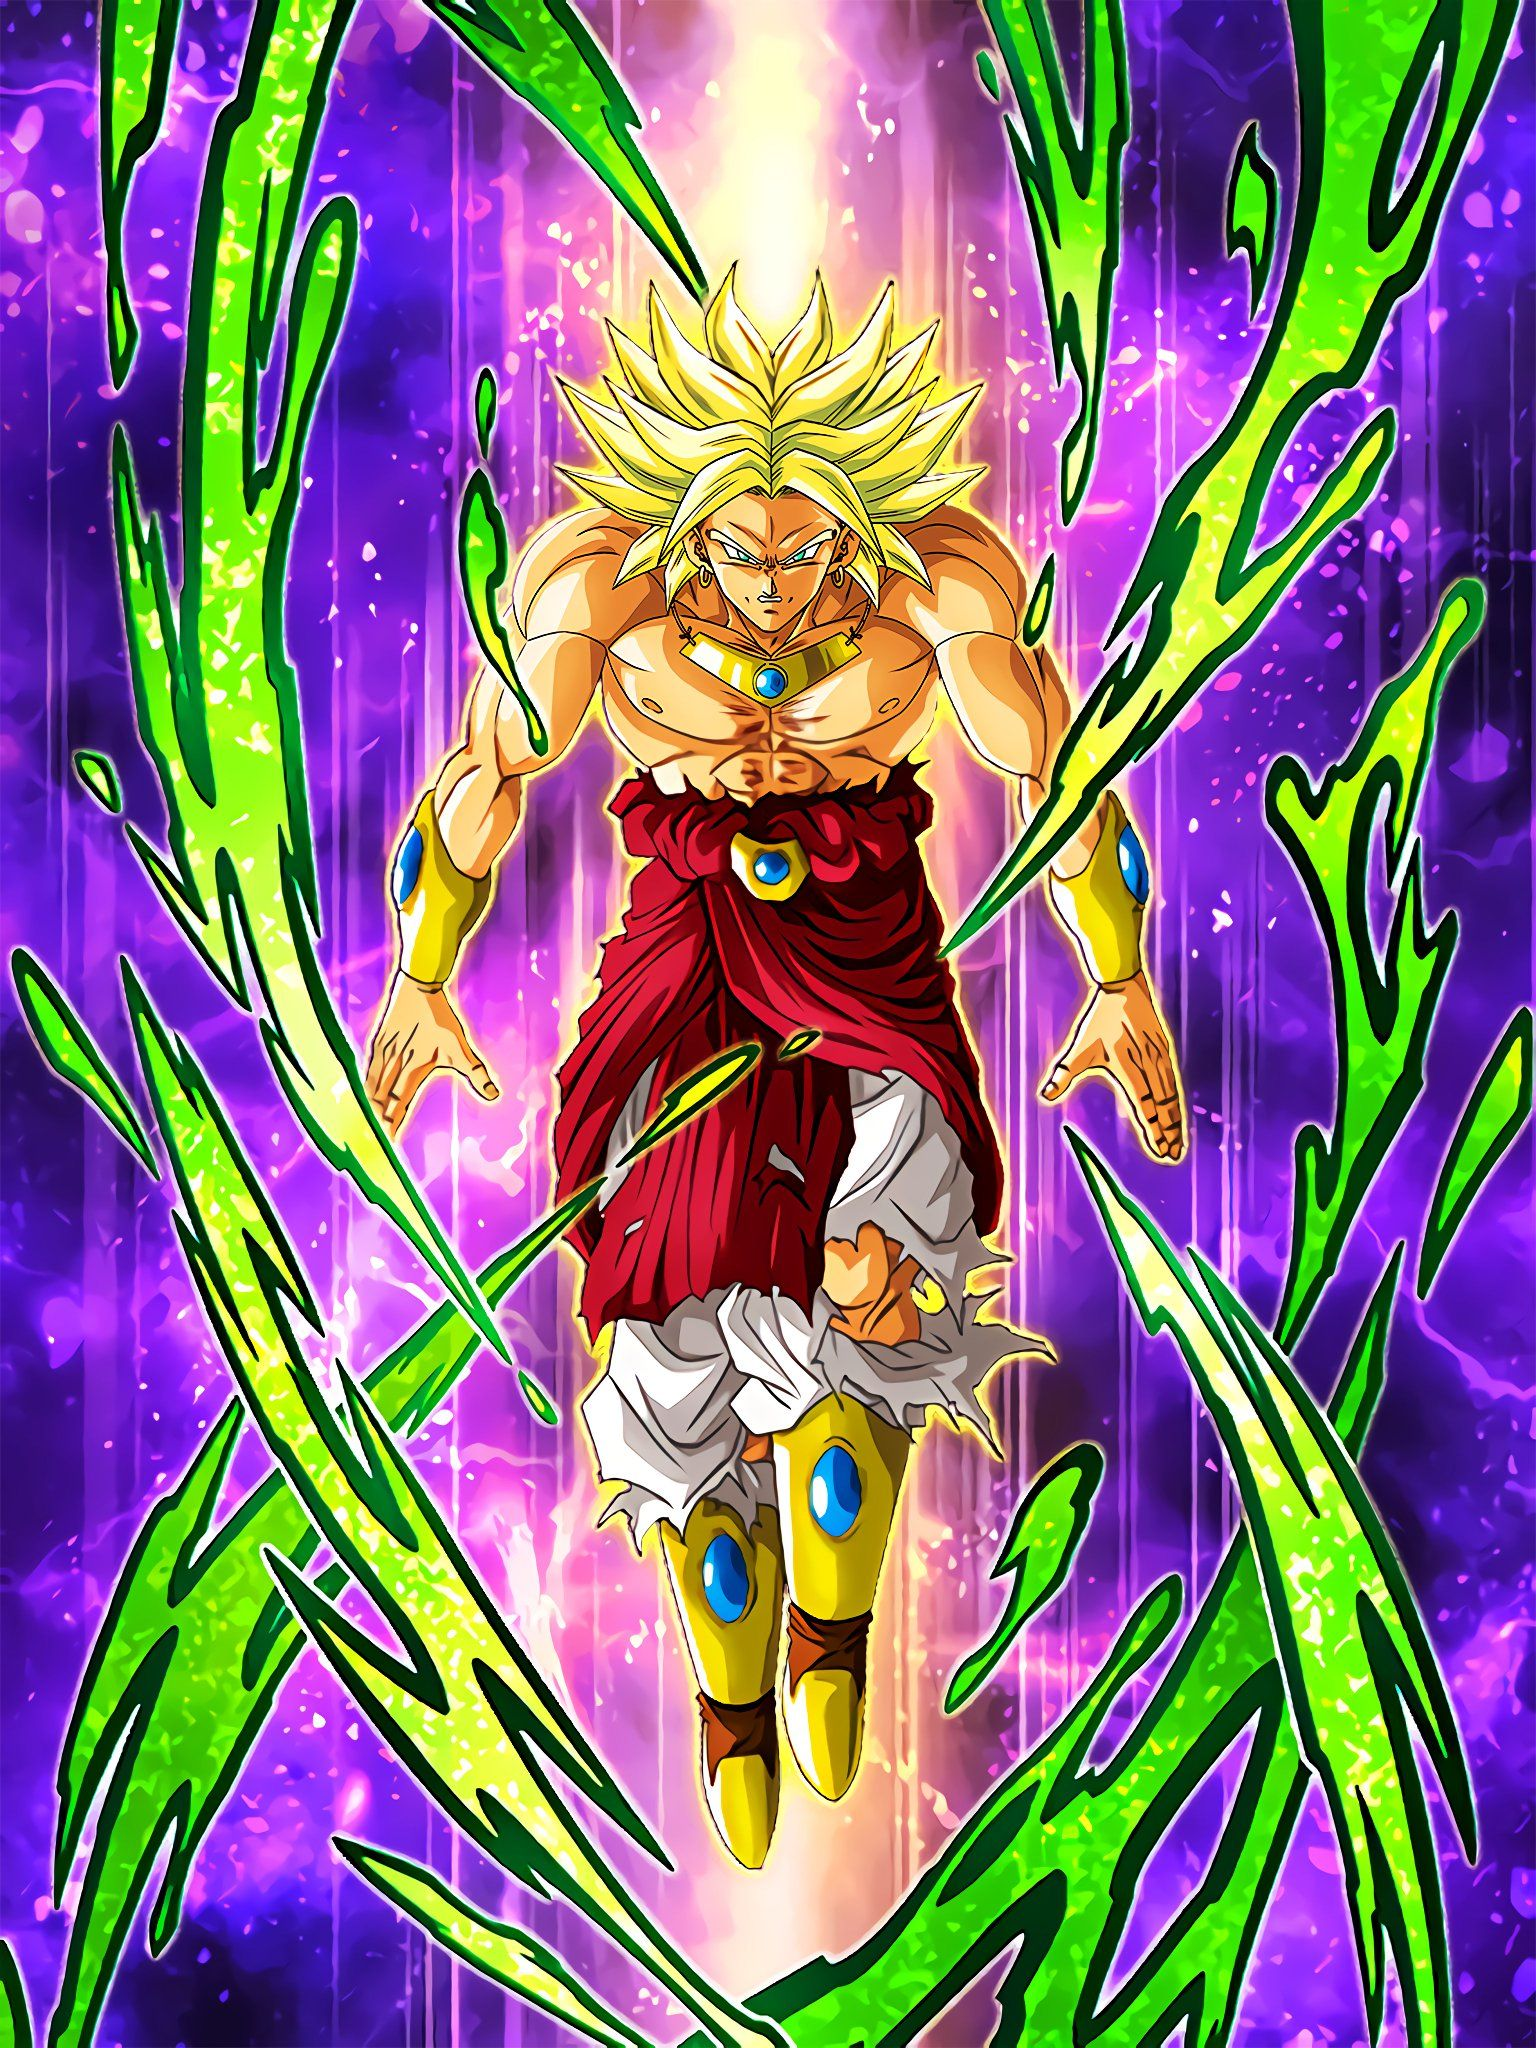 Hydros On Twitter Dragon Ball Art Dragon Ball Artwork Dragon Ball Super